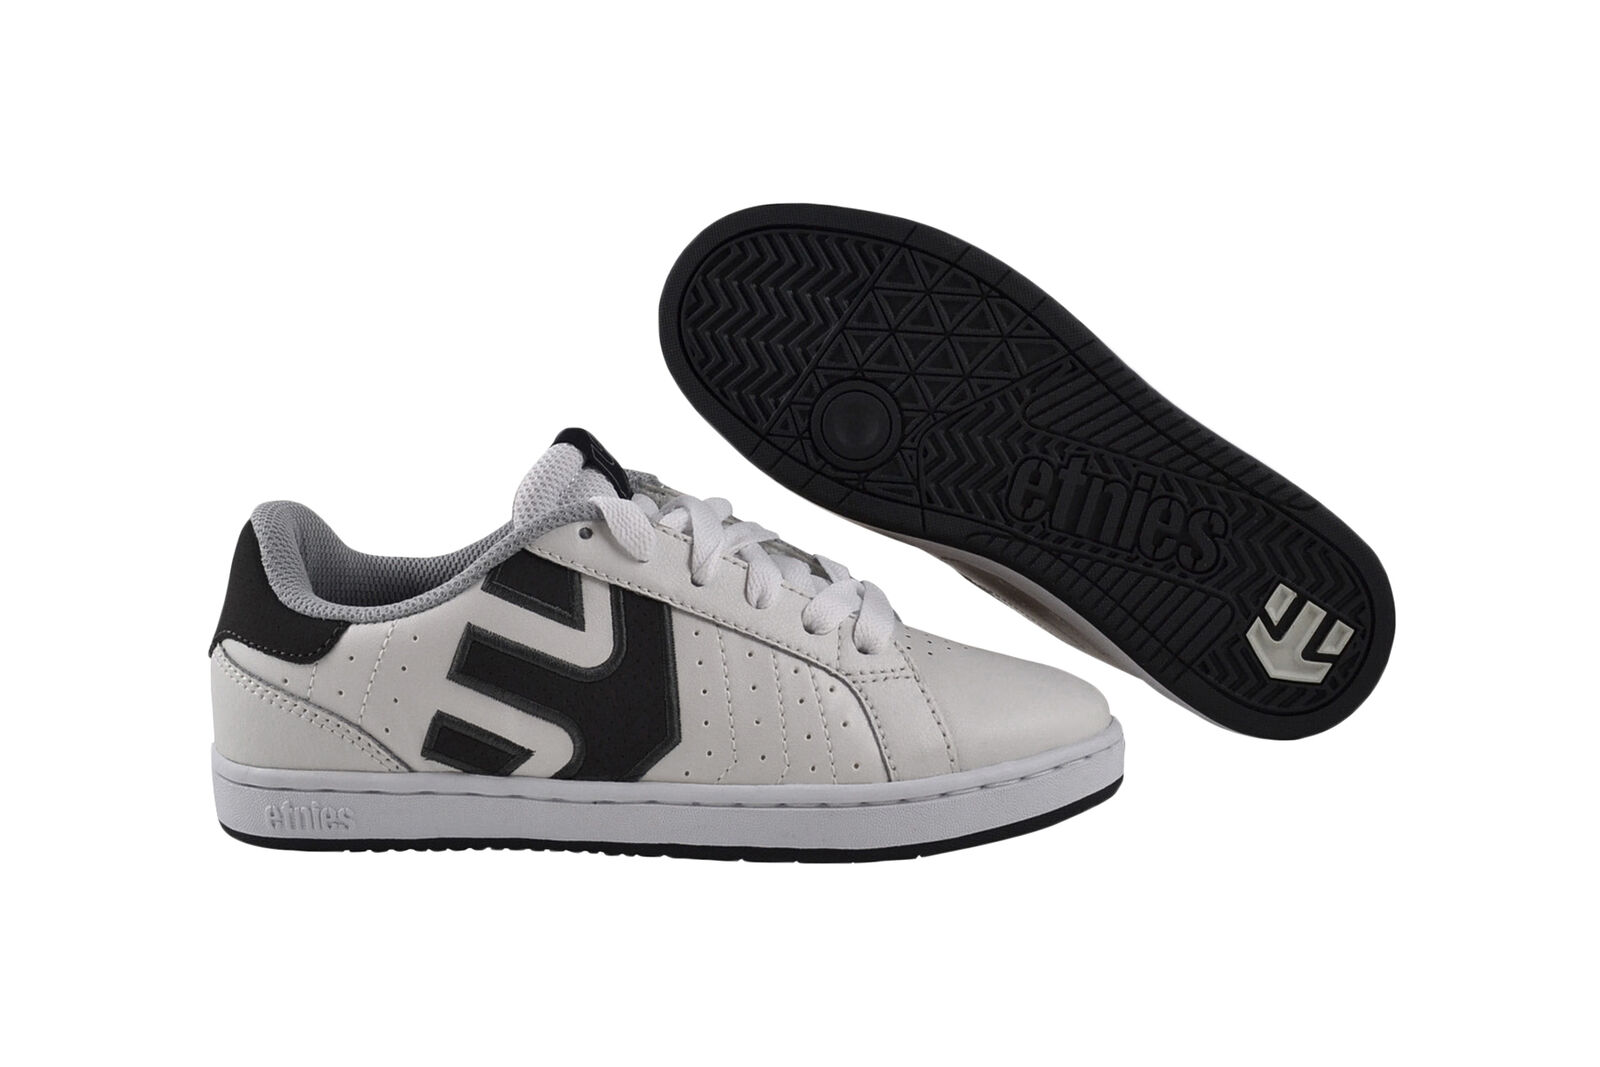 zapatos hombre FDF Zapatos zapatillas beige pelle BZ680 BZ680 pelle 3add37